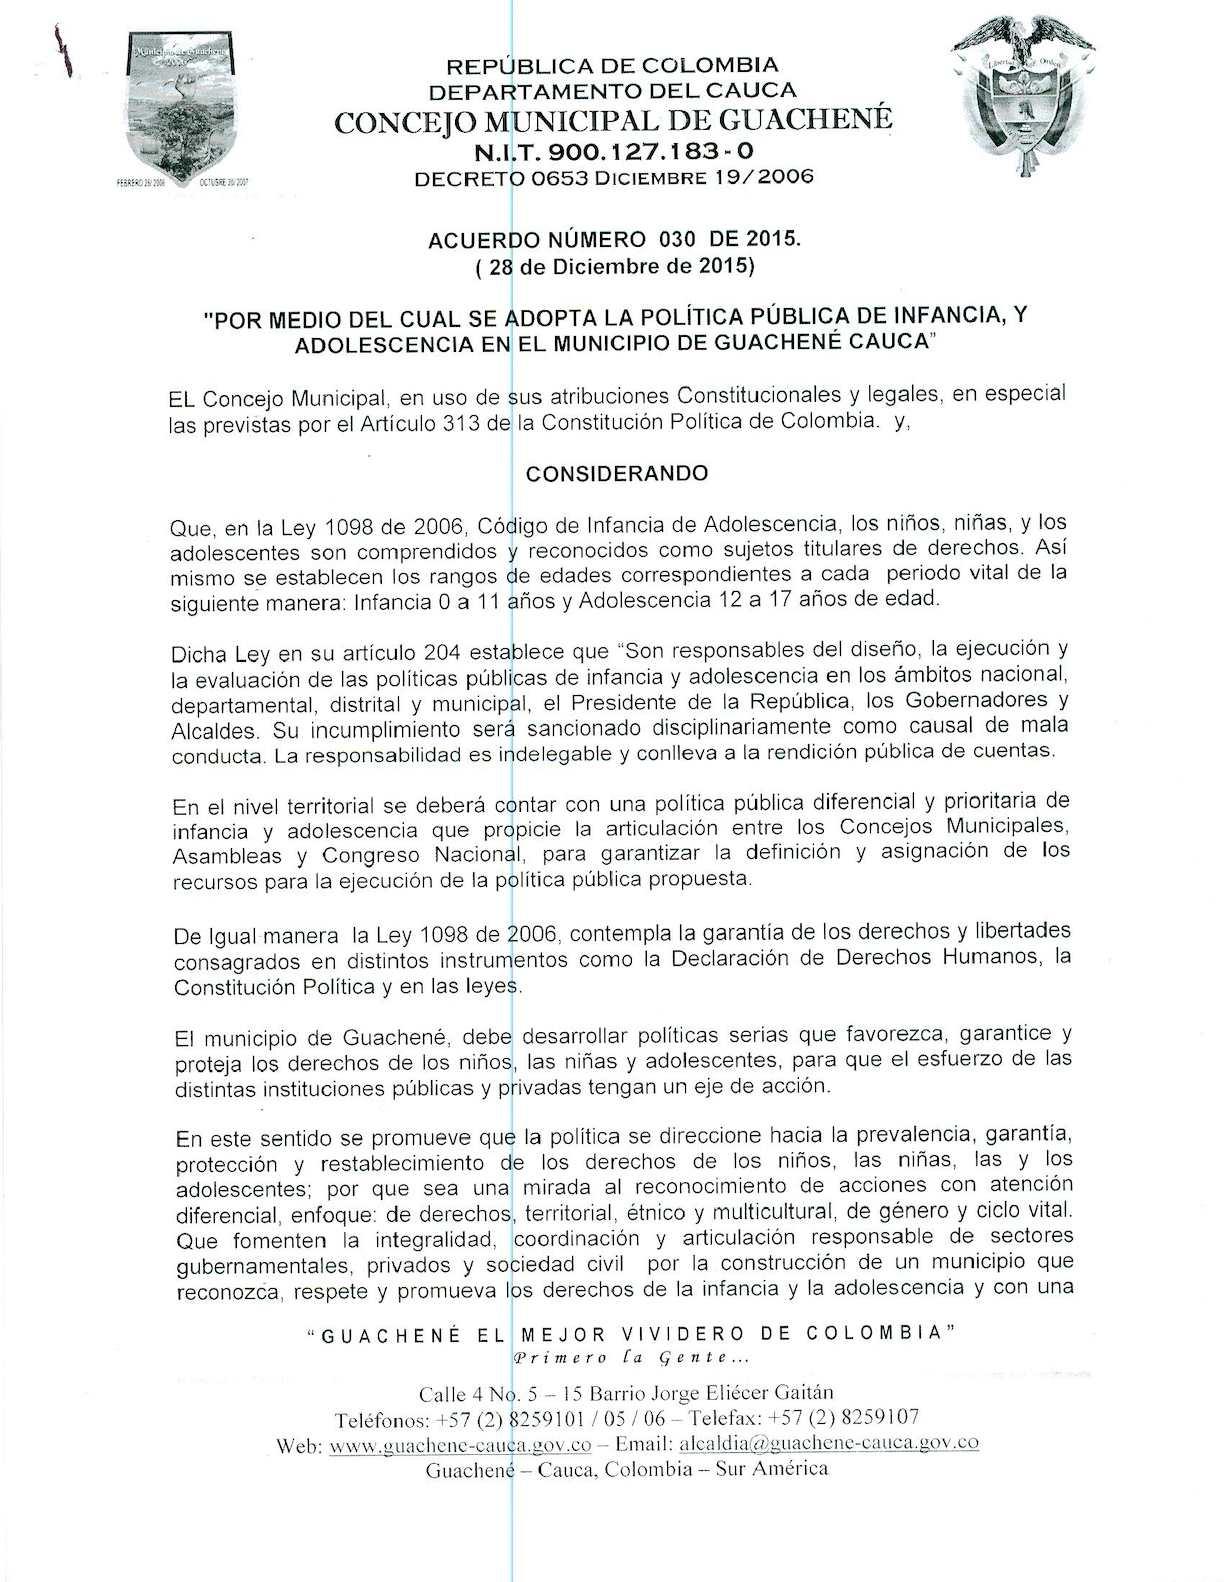 Acuerdo No. 030 de 2015 - Municipio de Guachené